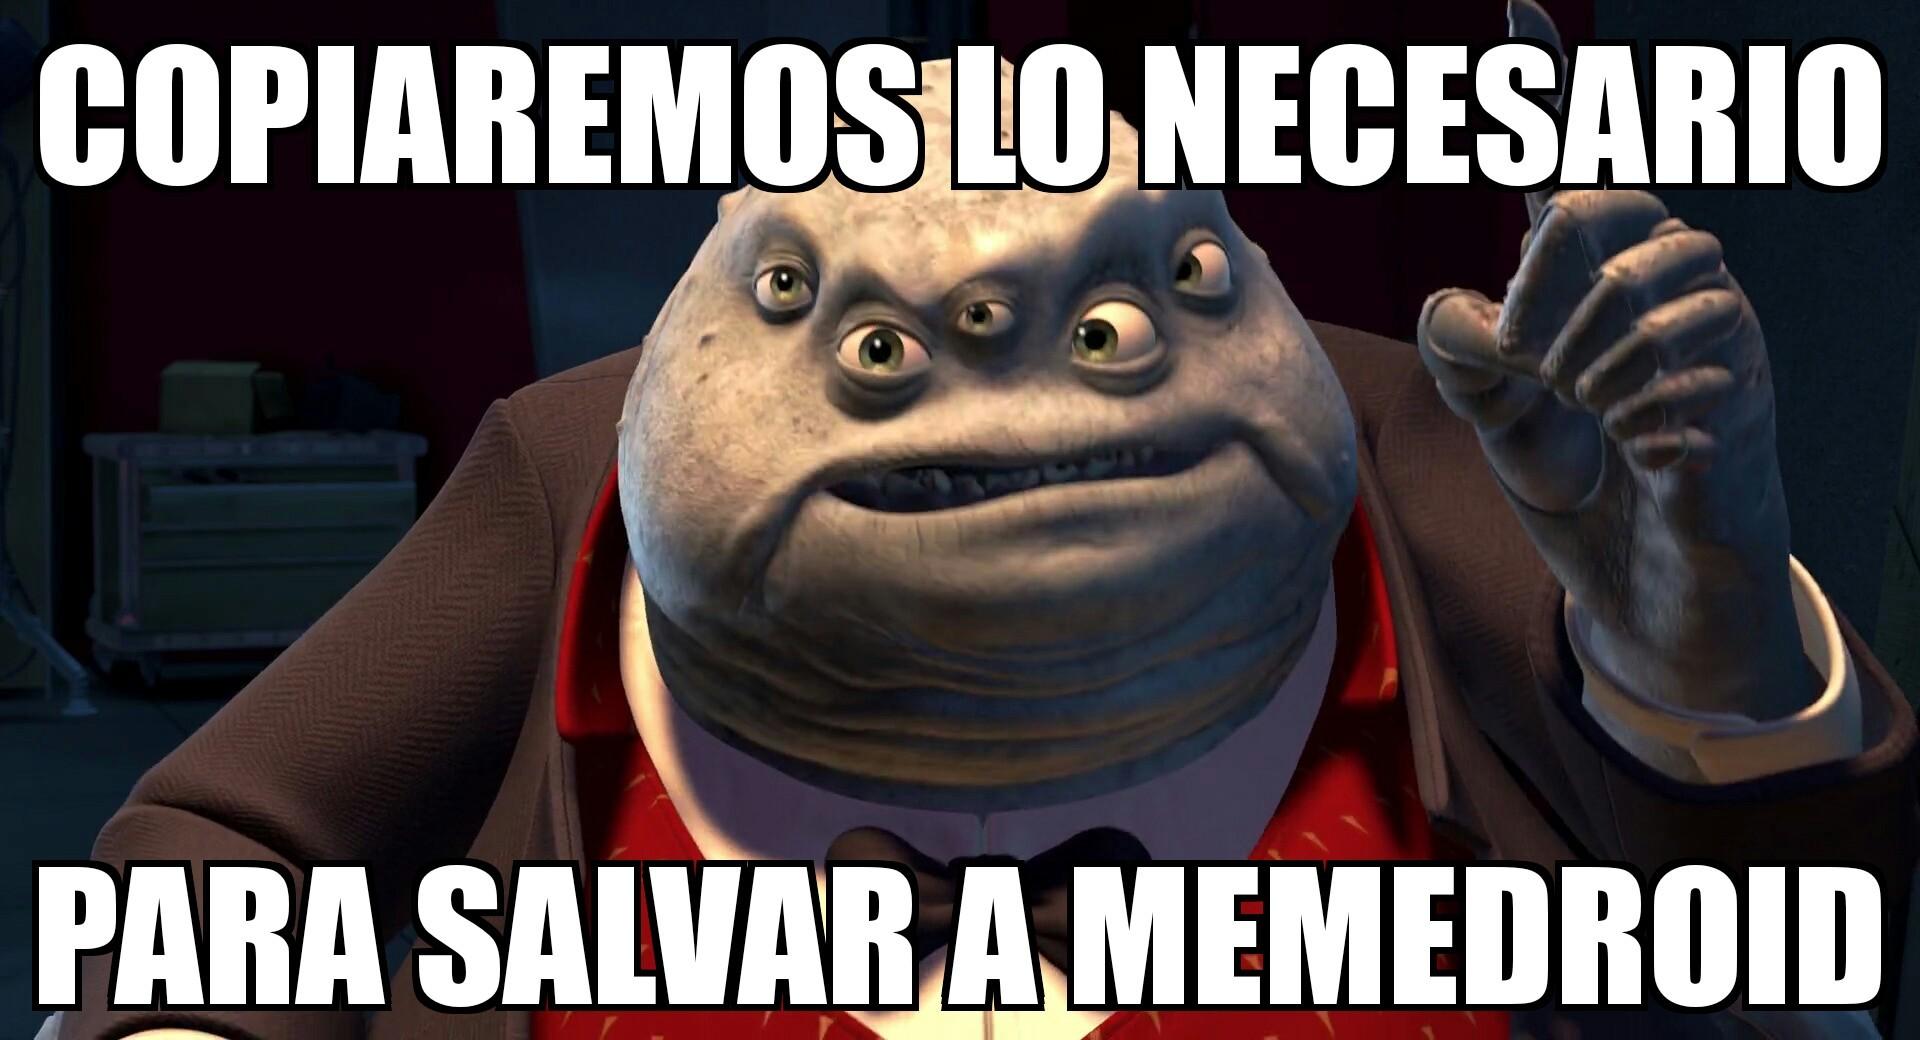 Monsters Inc. - meme